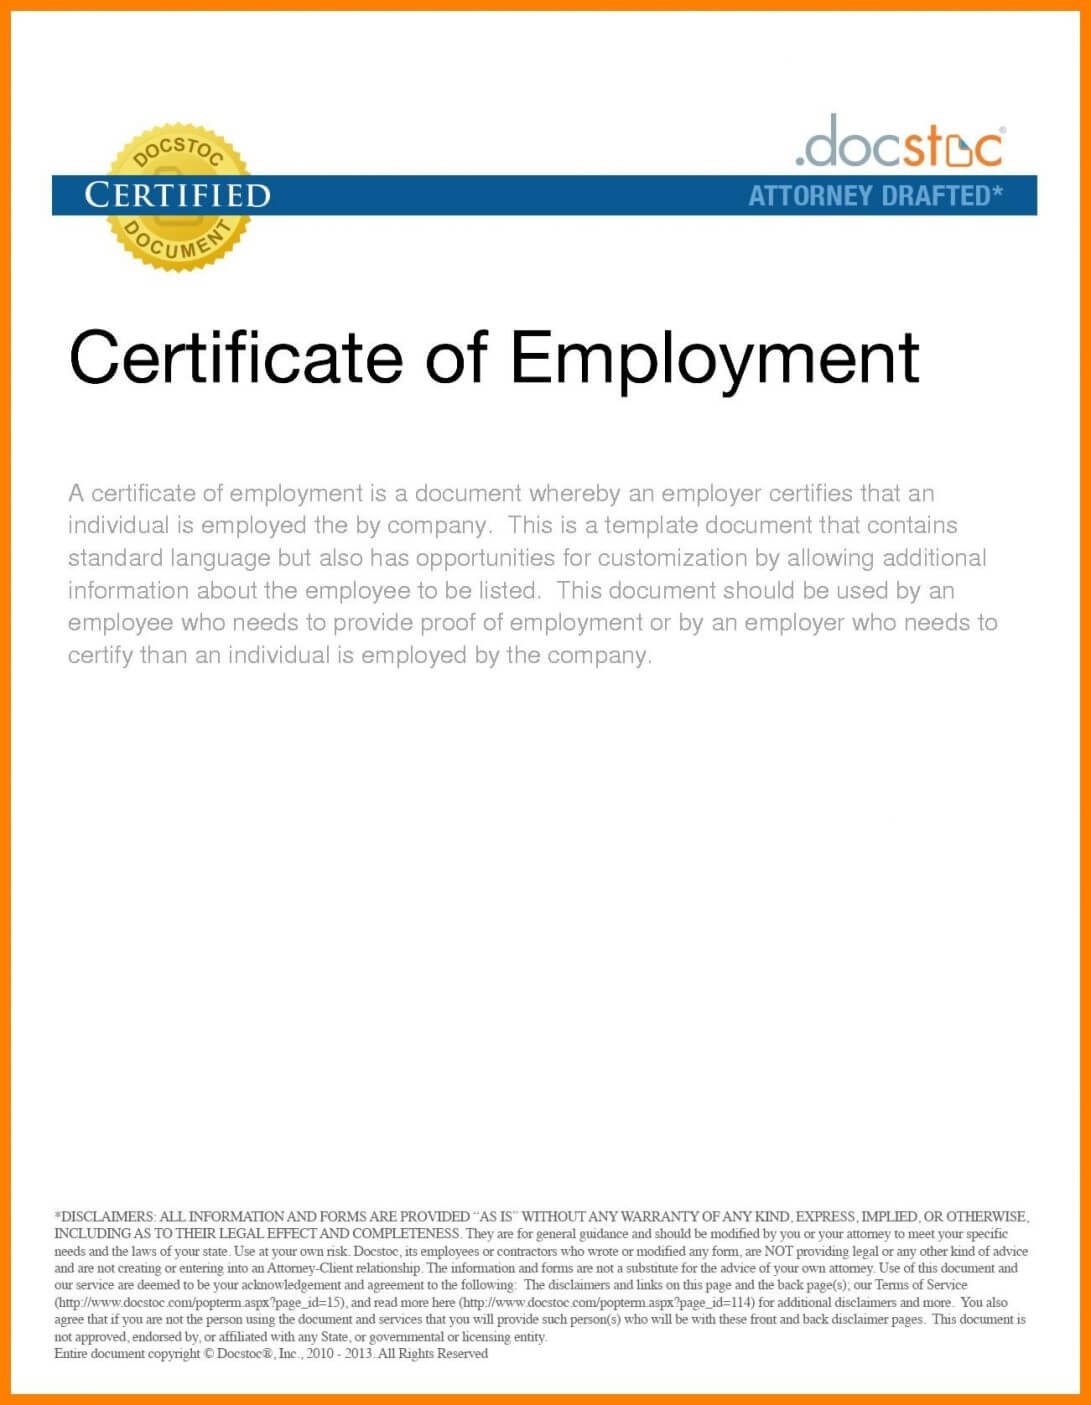 016 Sample Certificate Of Employment Certificates Stunning Regarding Employee Certificate Of Service Template